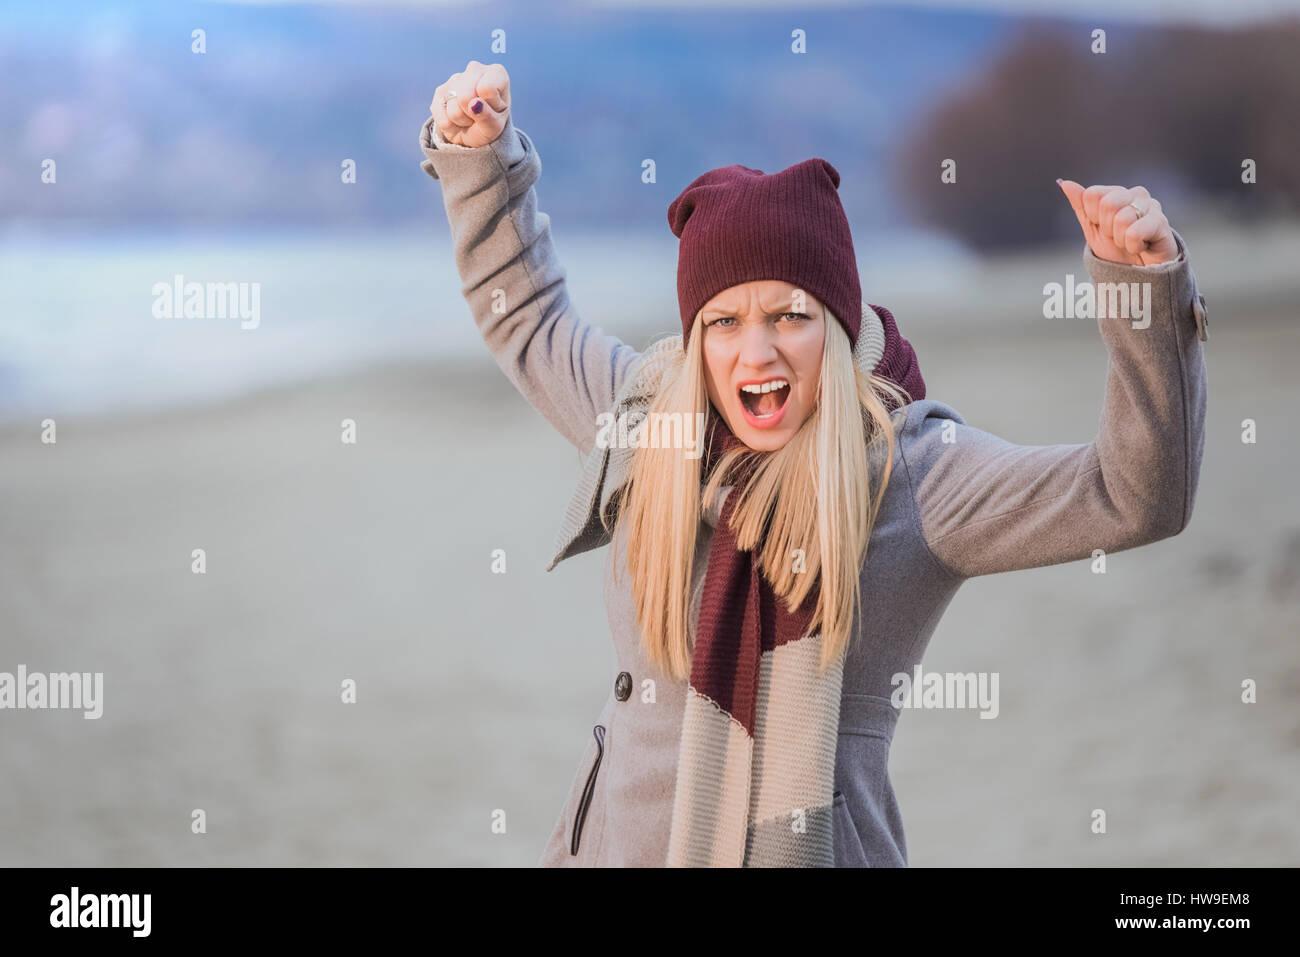 Young angry girl protesting - Stock Image